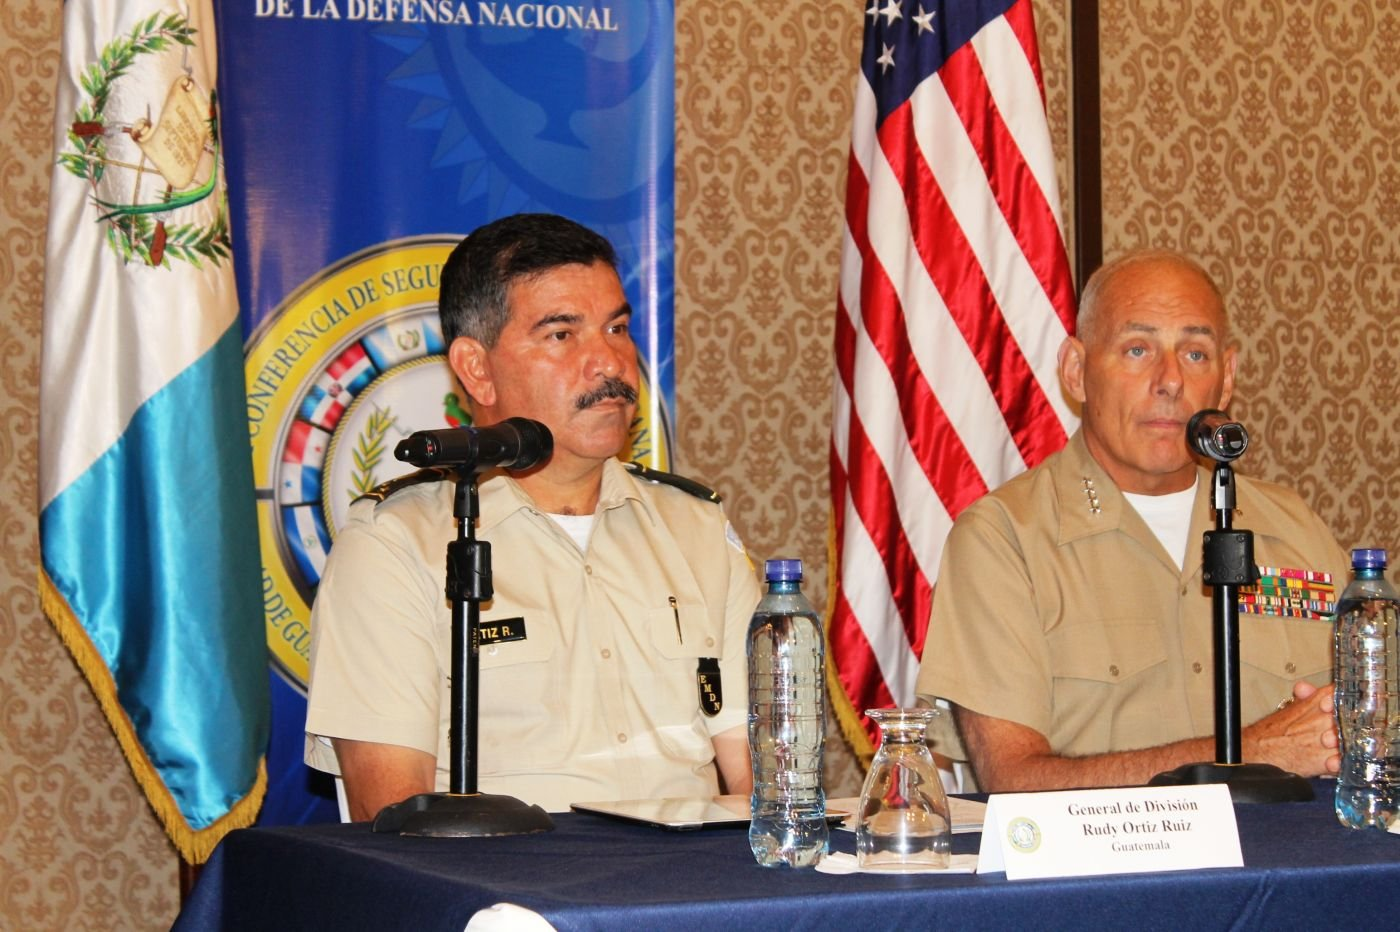 Condolence Statement from SOUTHCOM commander Gen. John Kelly on the loss of Guatemalan Maj. Gen. Rudy Ortiz, other crash victims